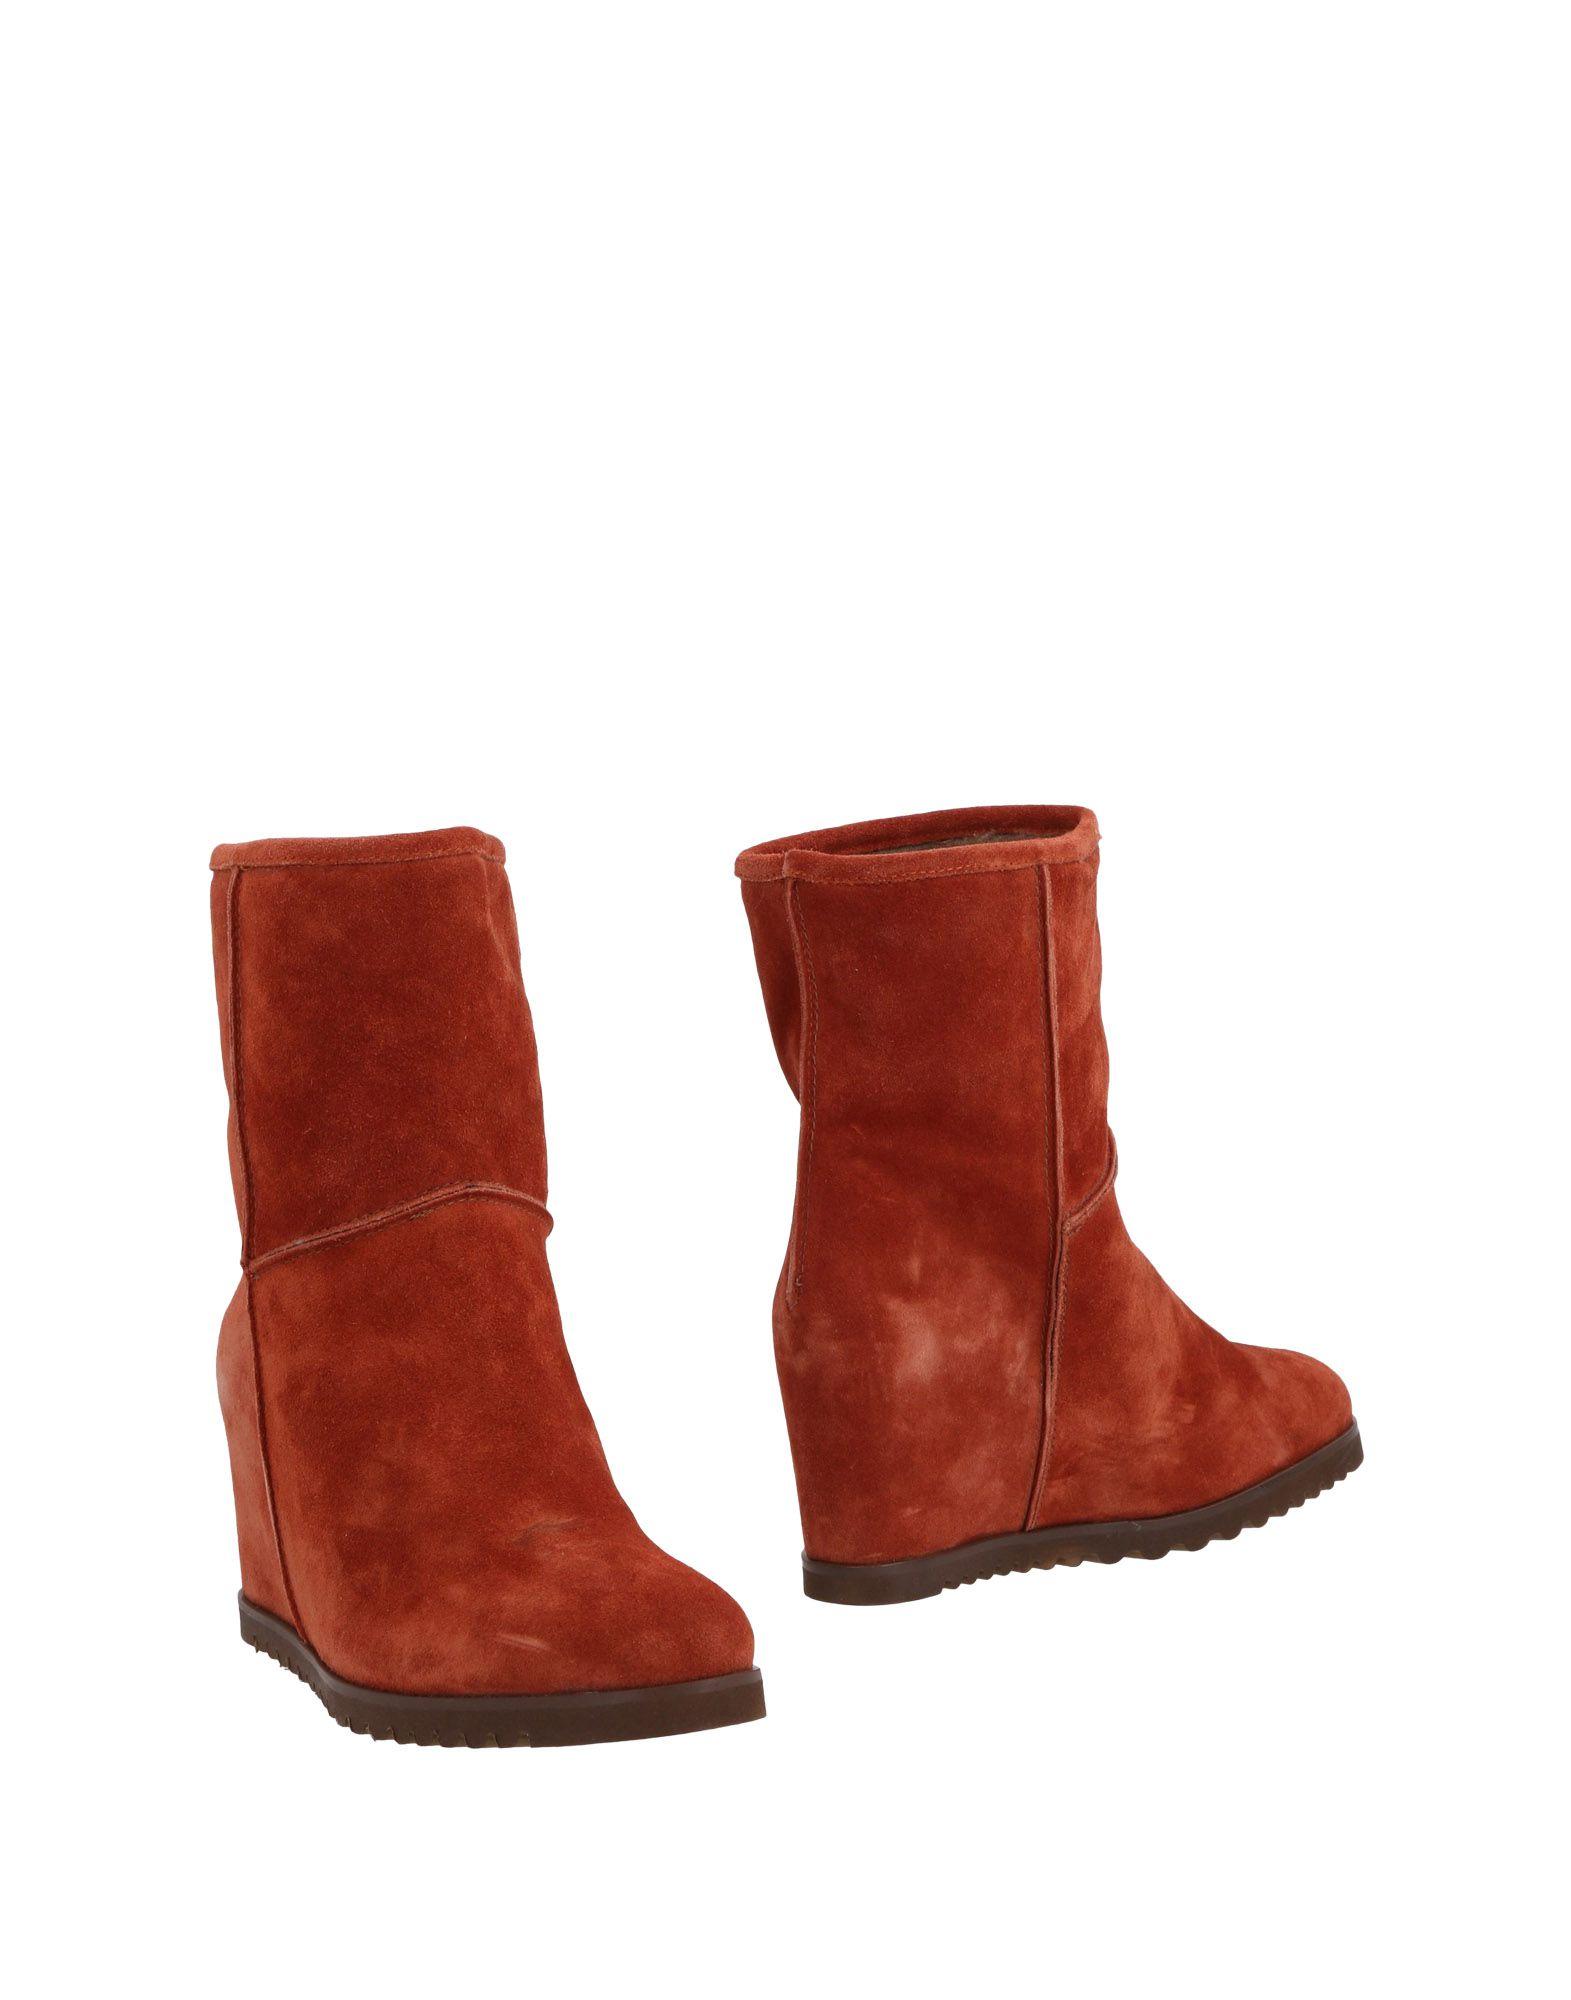 Fabio Rusconi Ankle Boot - Women online Fabio Rusconi Ankle Boots online Women on  Australia - 44958255HW be604d